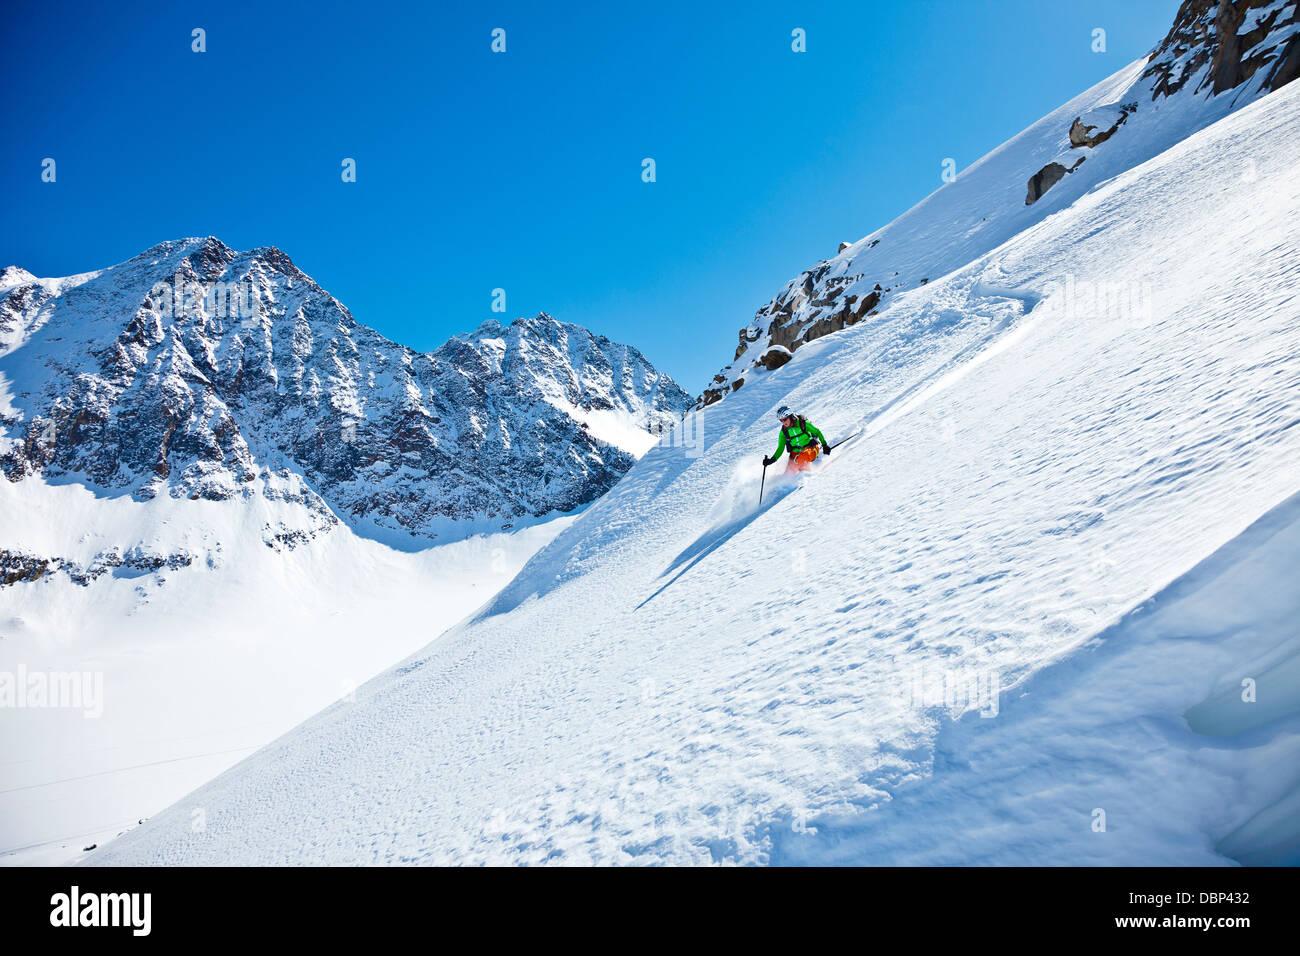 Female skier skiing downhill, Stubai, Tyrol, Austria - Stock Image